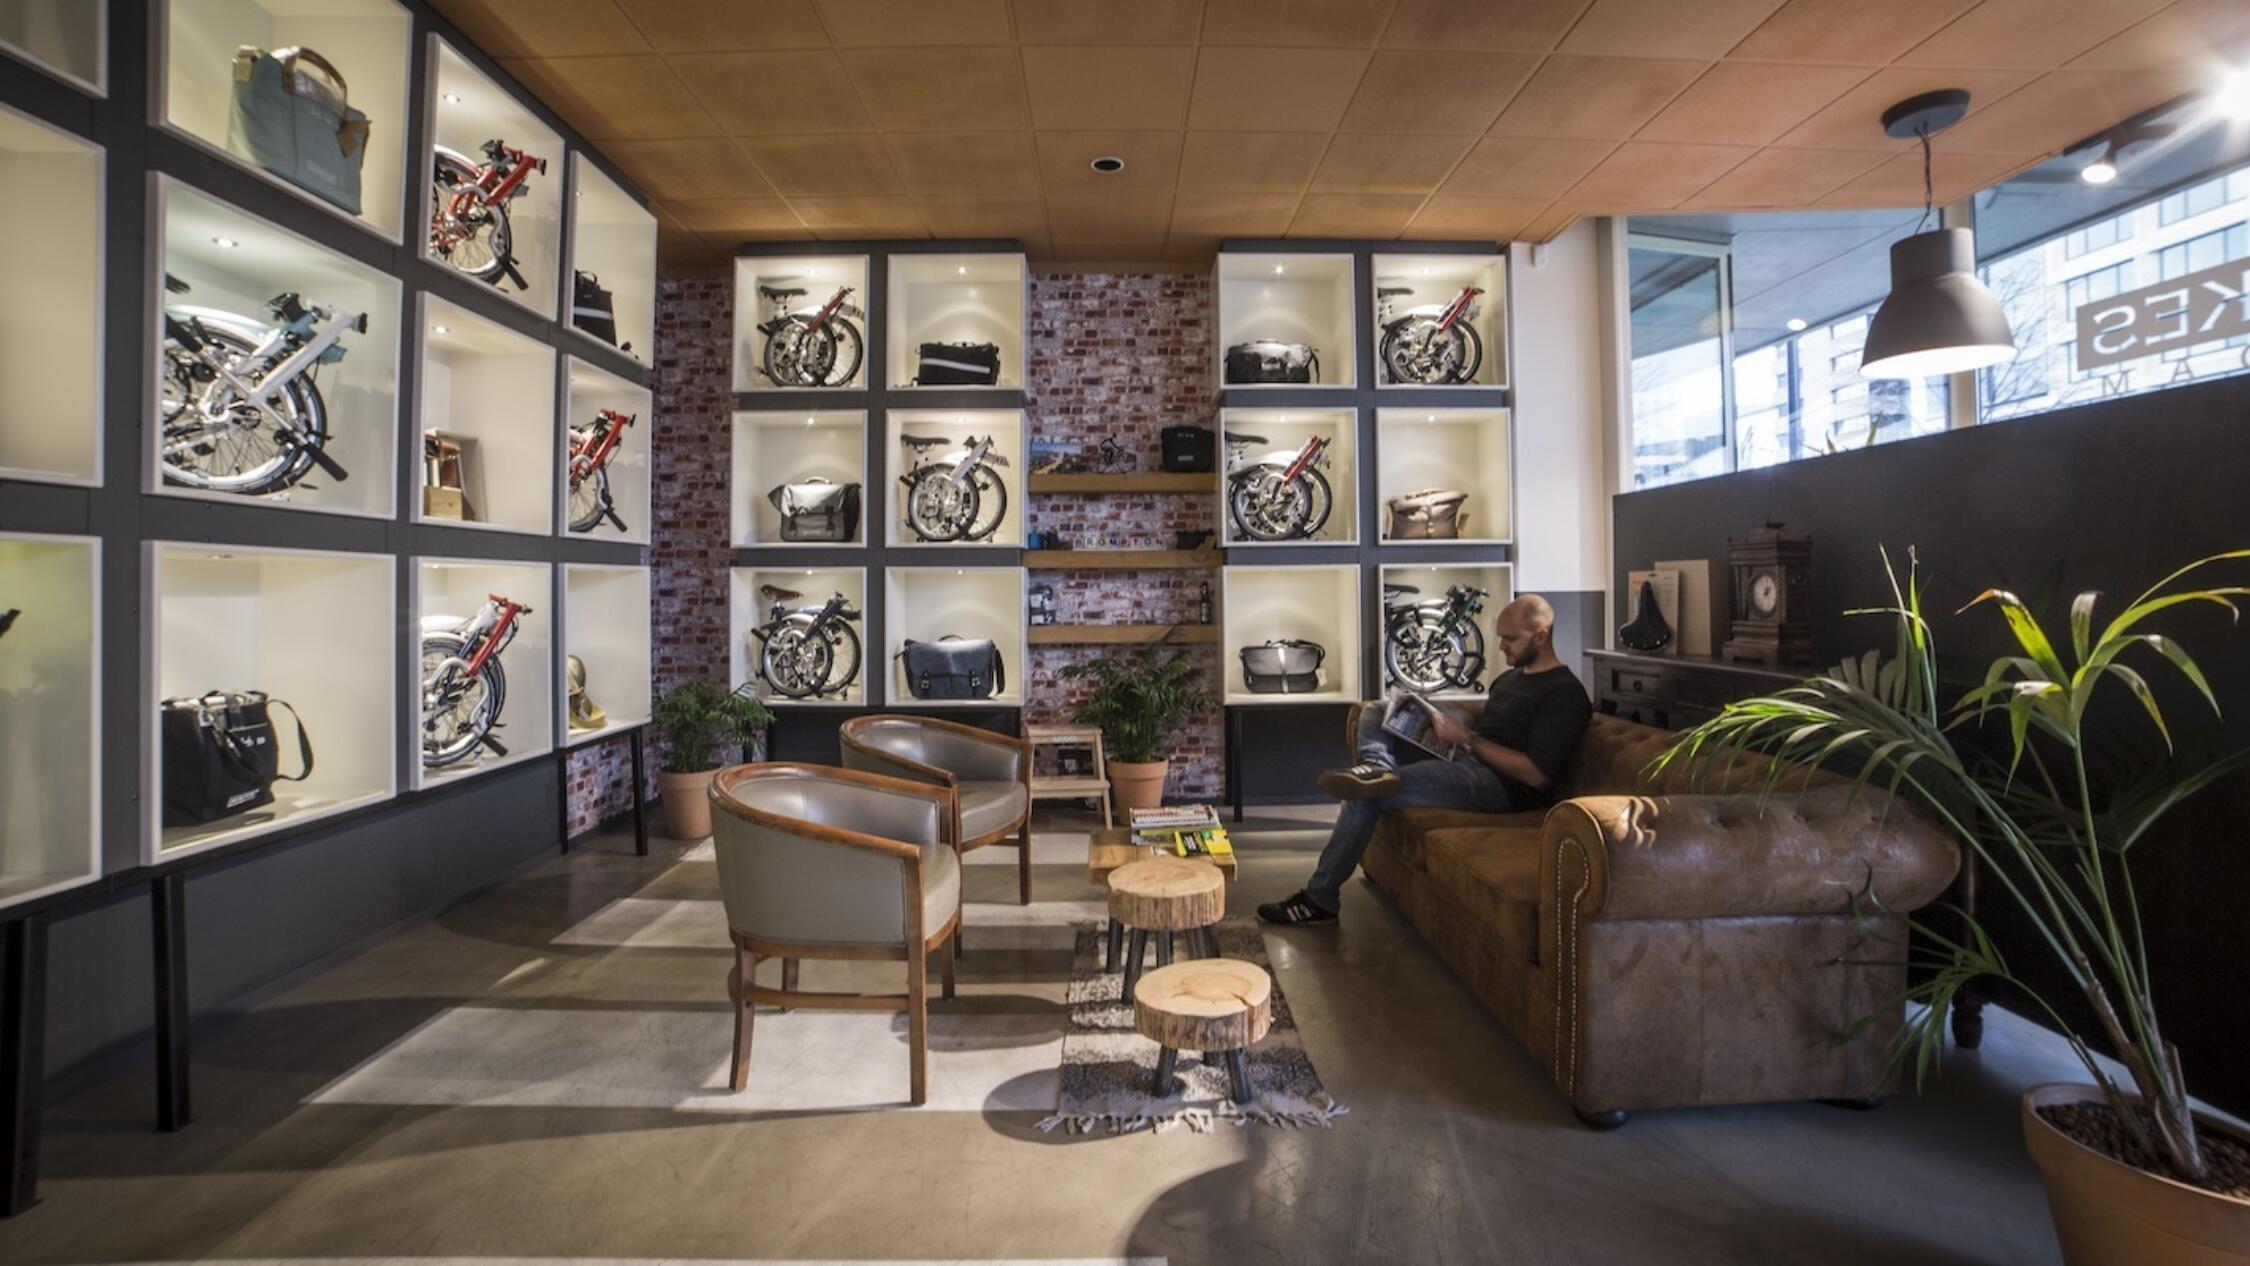 Groot Handelsgebouw interior common area with man sitting on sofa reading